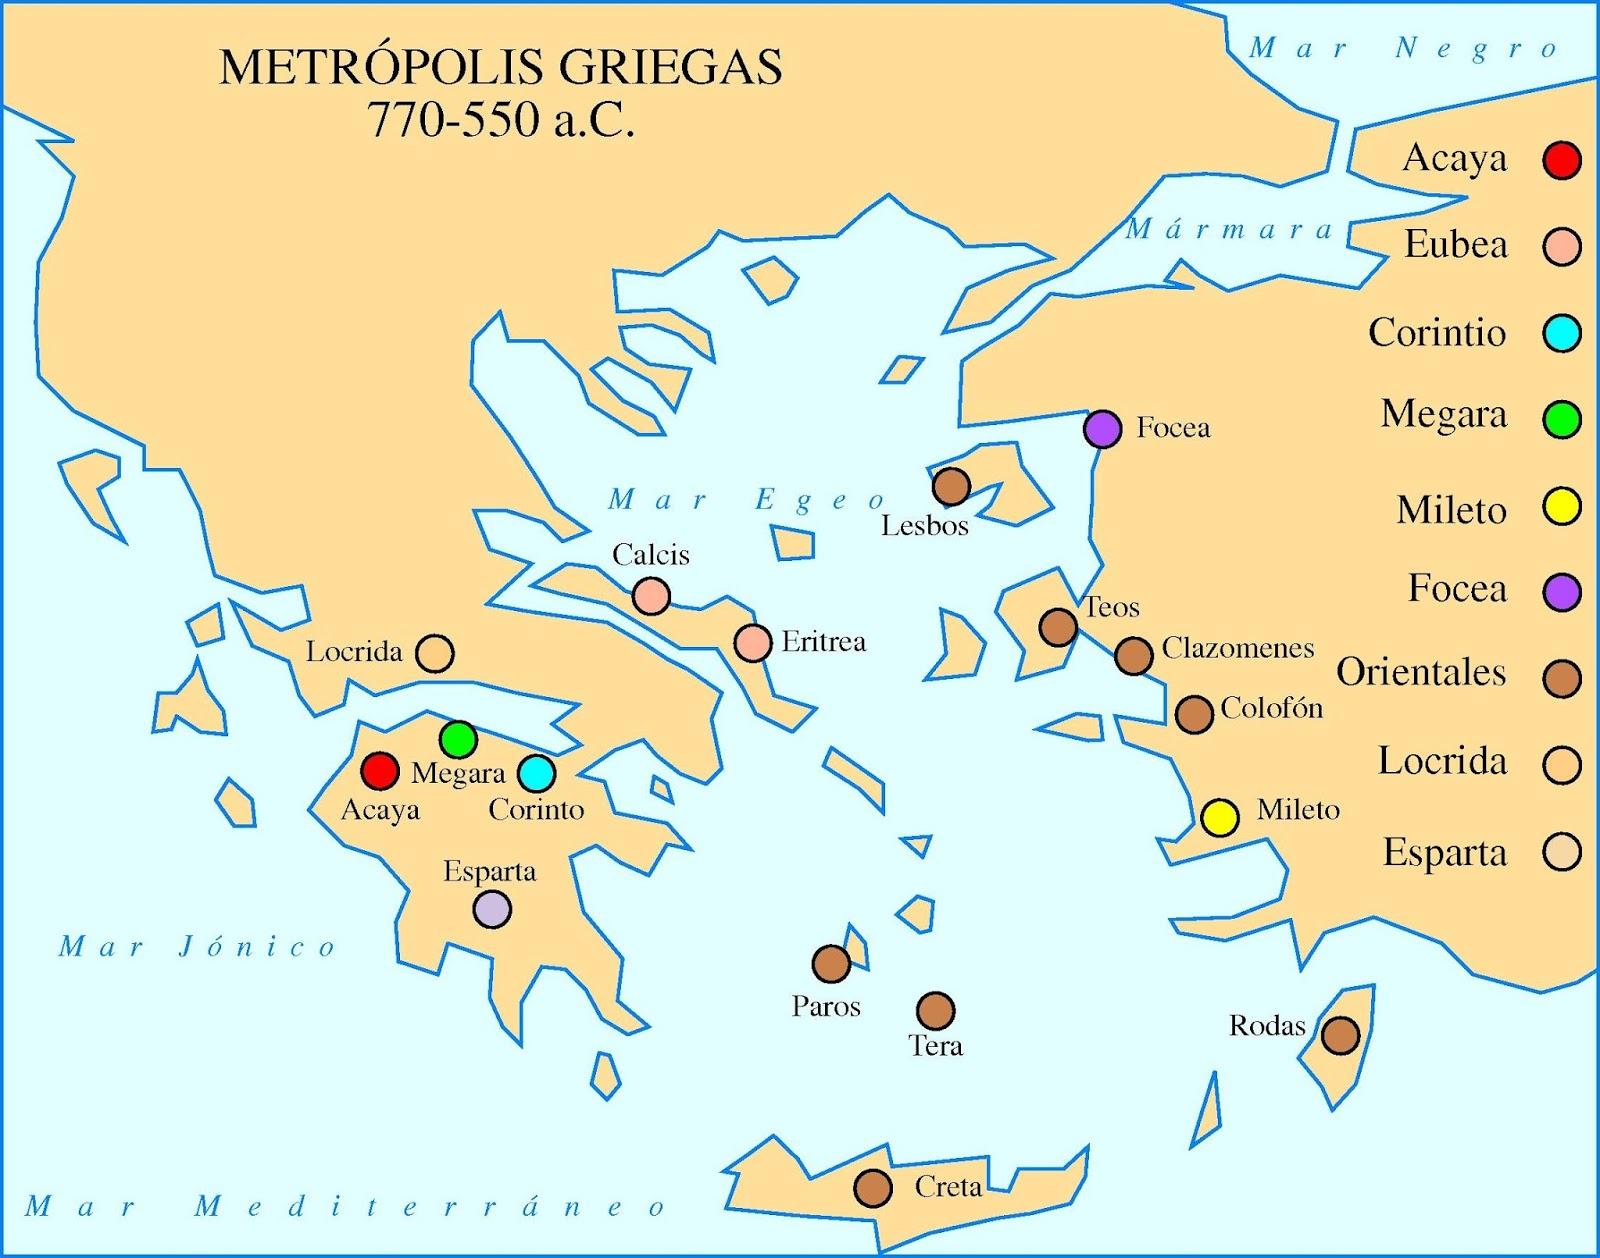 Facebook Marcador De Posición Para Ubicar Lugares En: Geografía E Historia: Grecia. Mapas